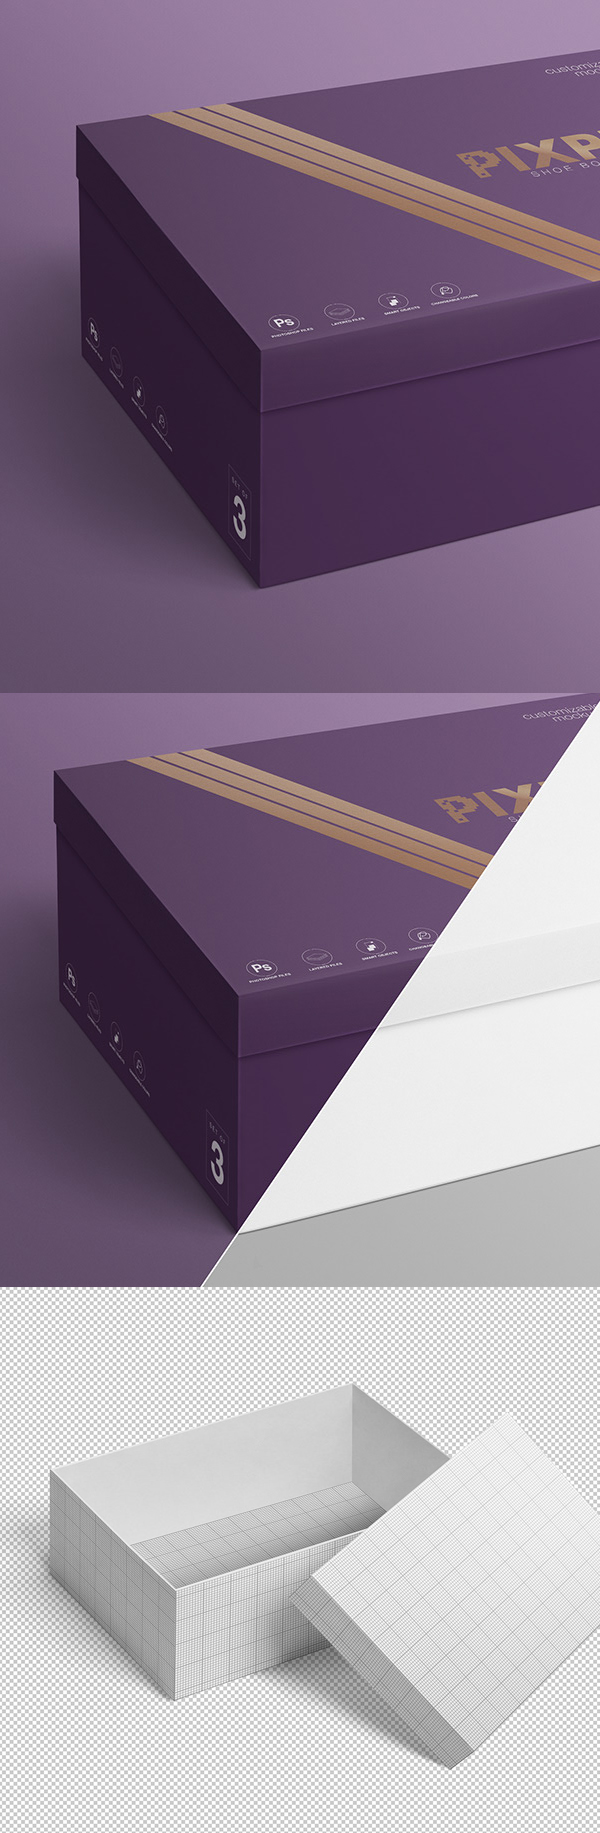 Free Shoe Box Mockup Set